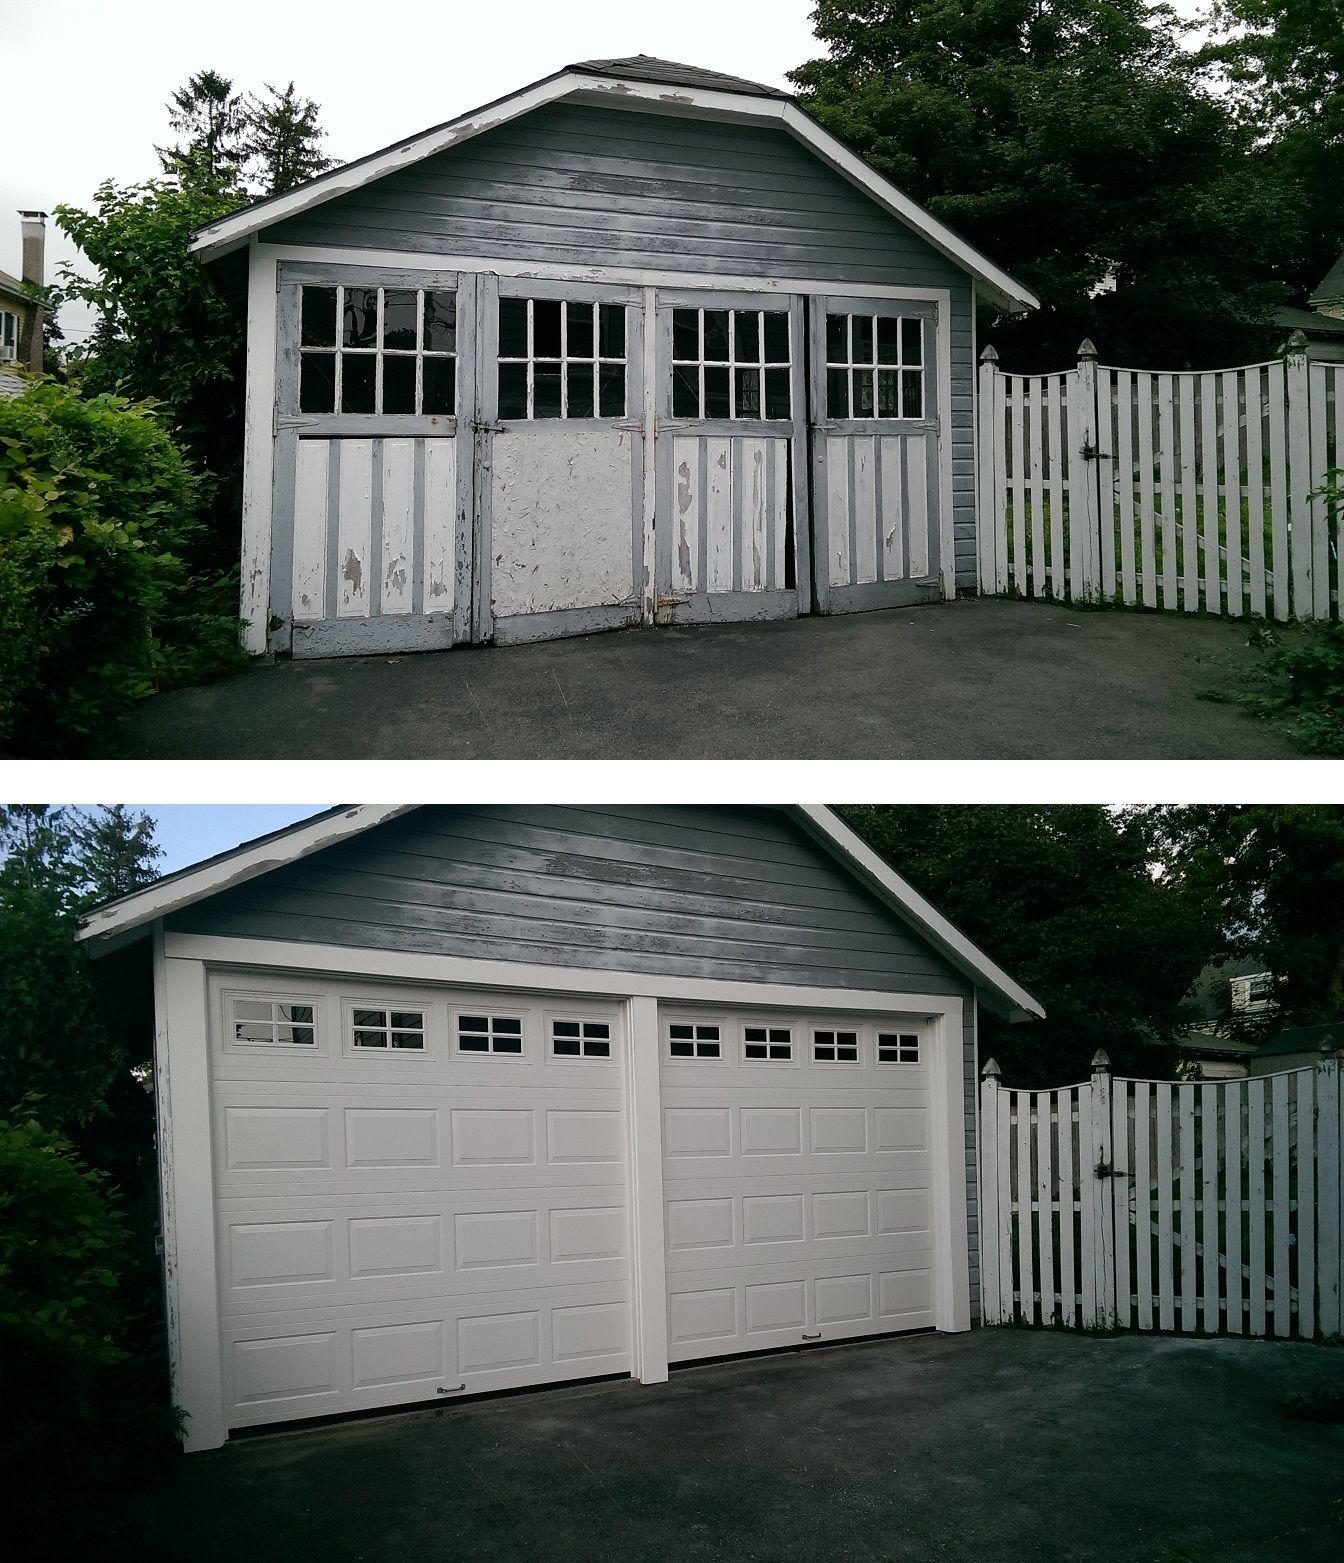 Old wood swing doors replaced with Haas model 680 raised